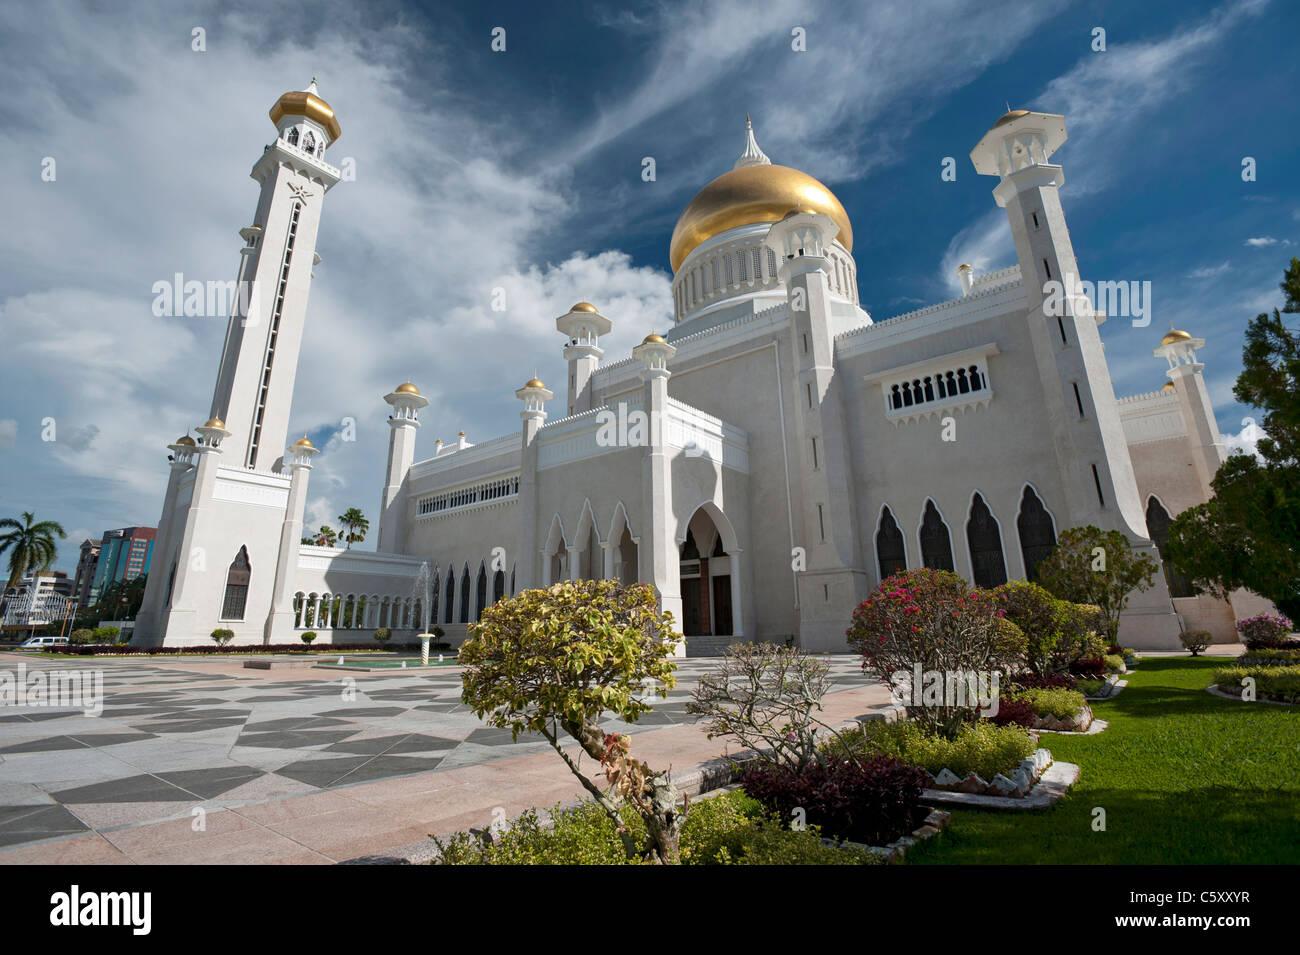 The Sultan Omar Ali Saifuddin Mosque in Bandar Seri Begawan, Brunei - Stock Image